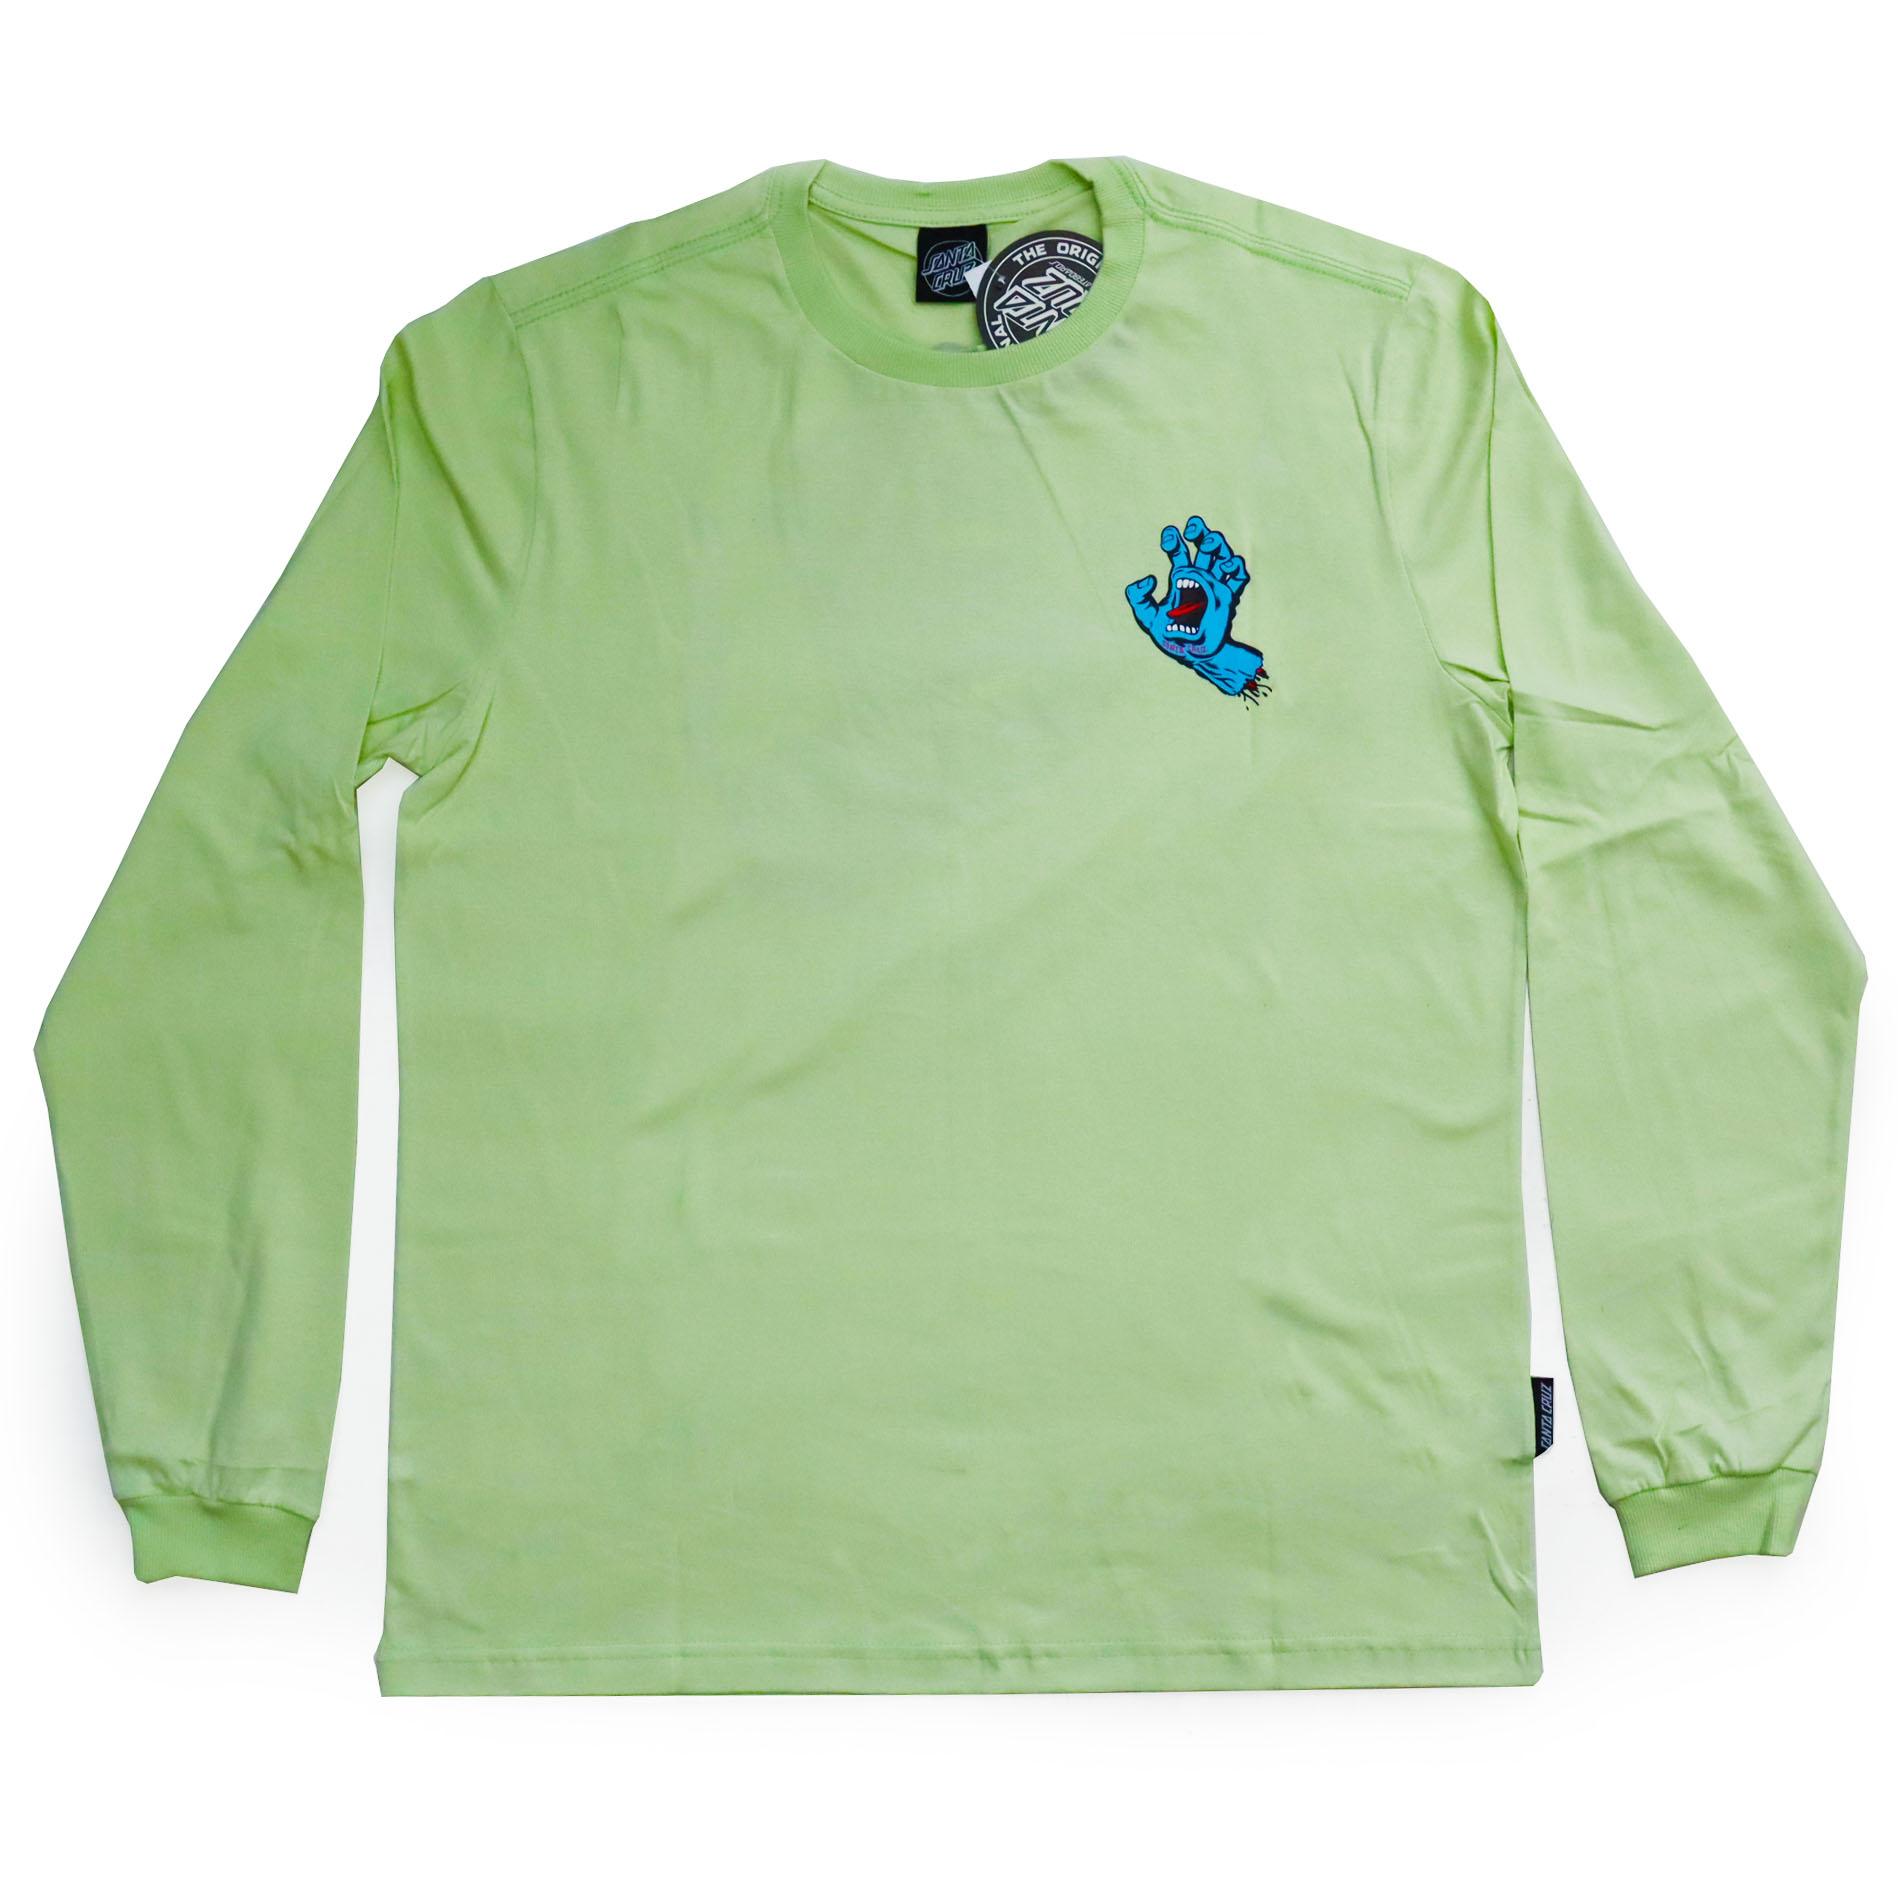 Camiseta Manga Longa Santa Cruz Frontandback Screaming Hand - Verde Claro